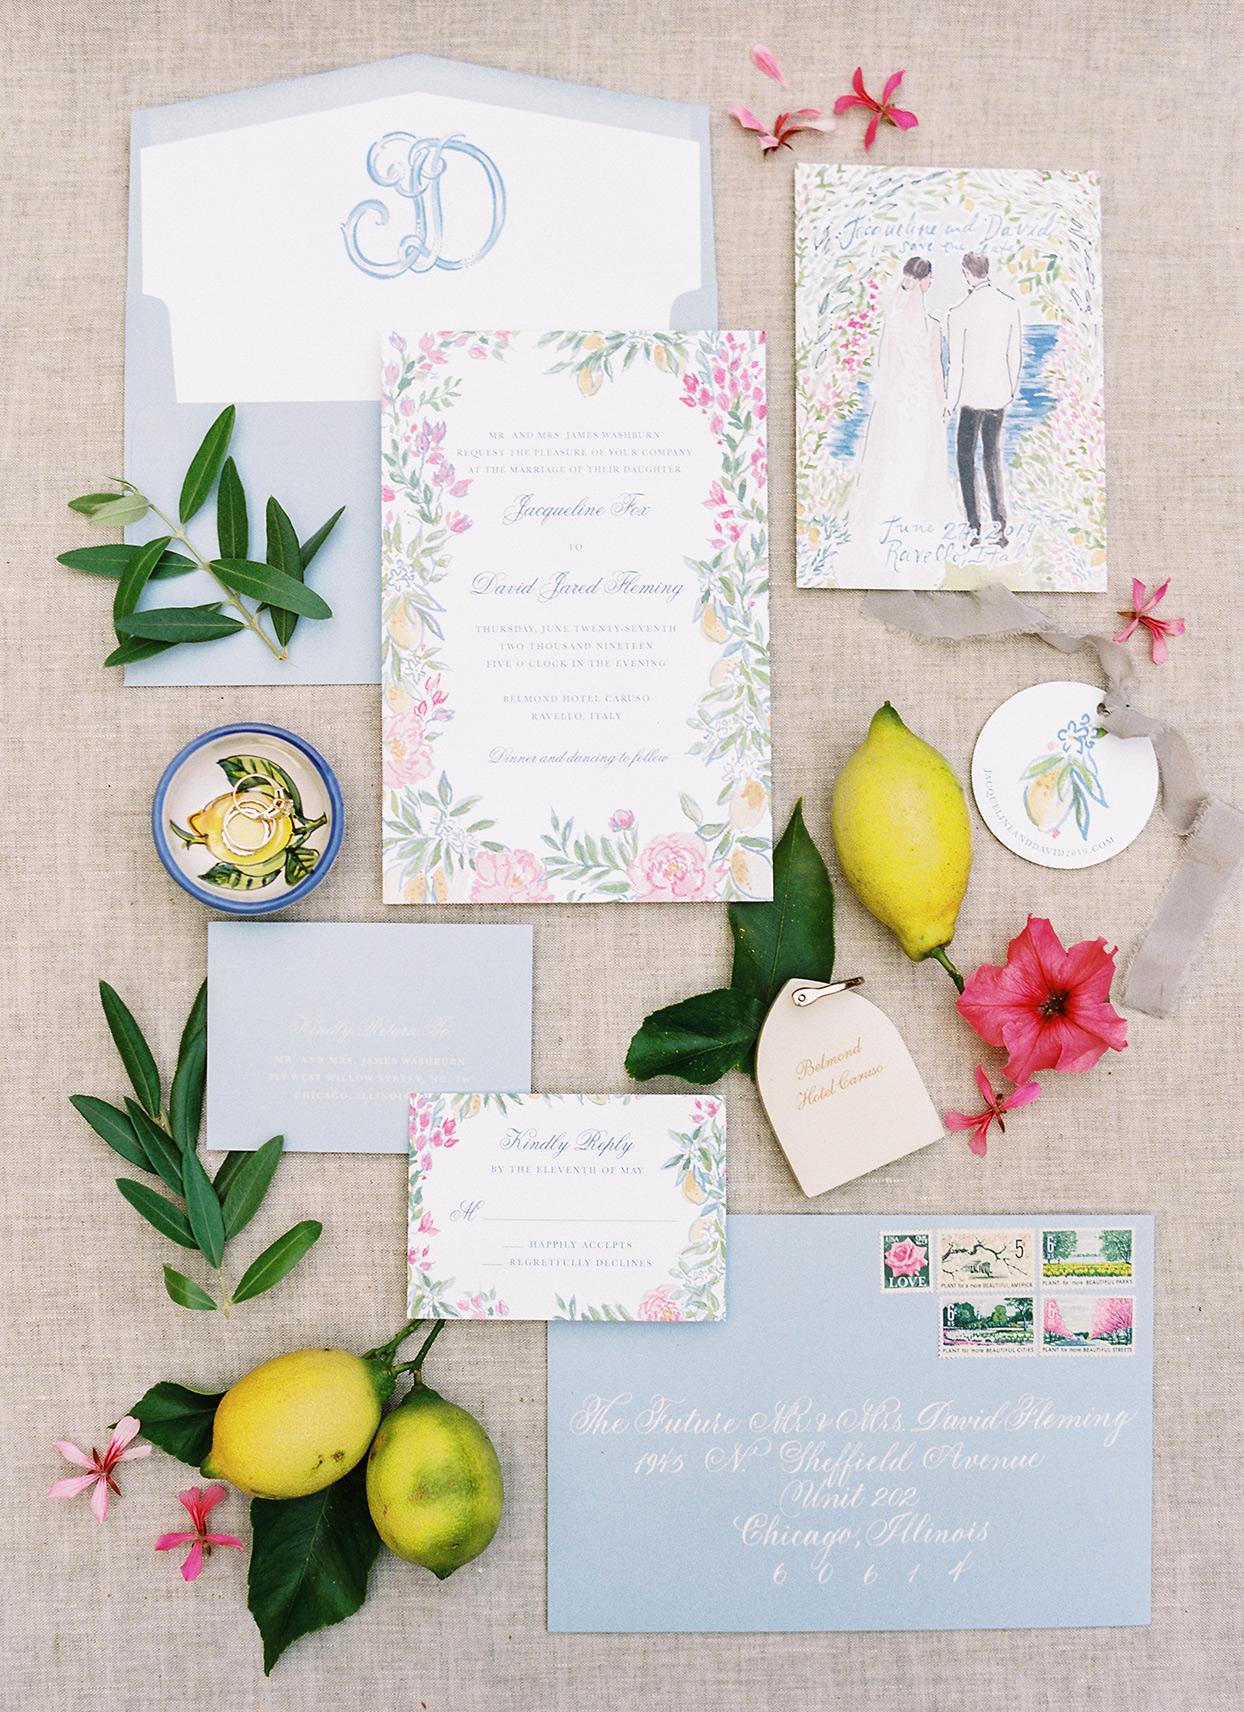 jacqueline david wedding blue pink and white invitations